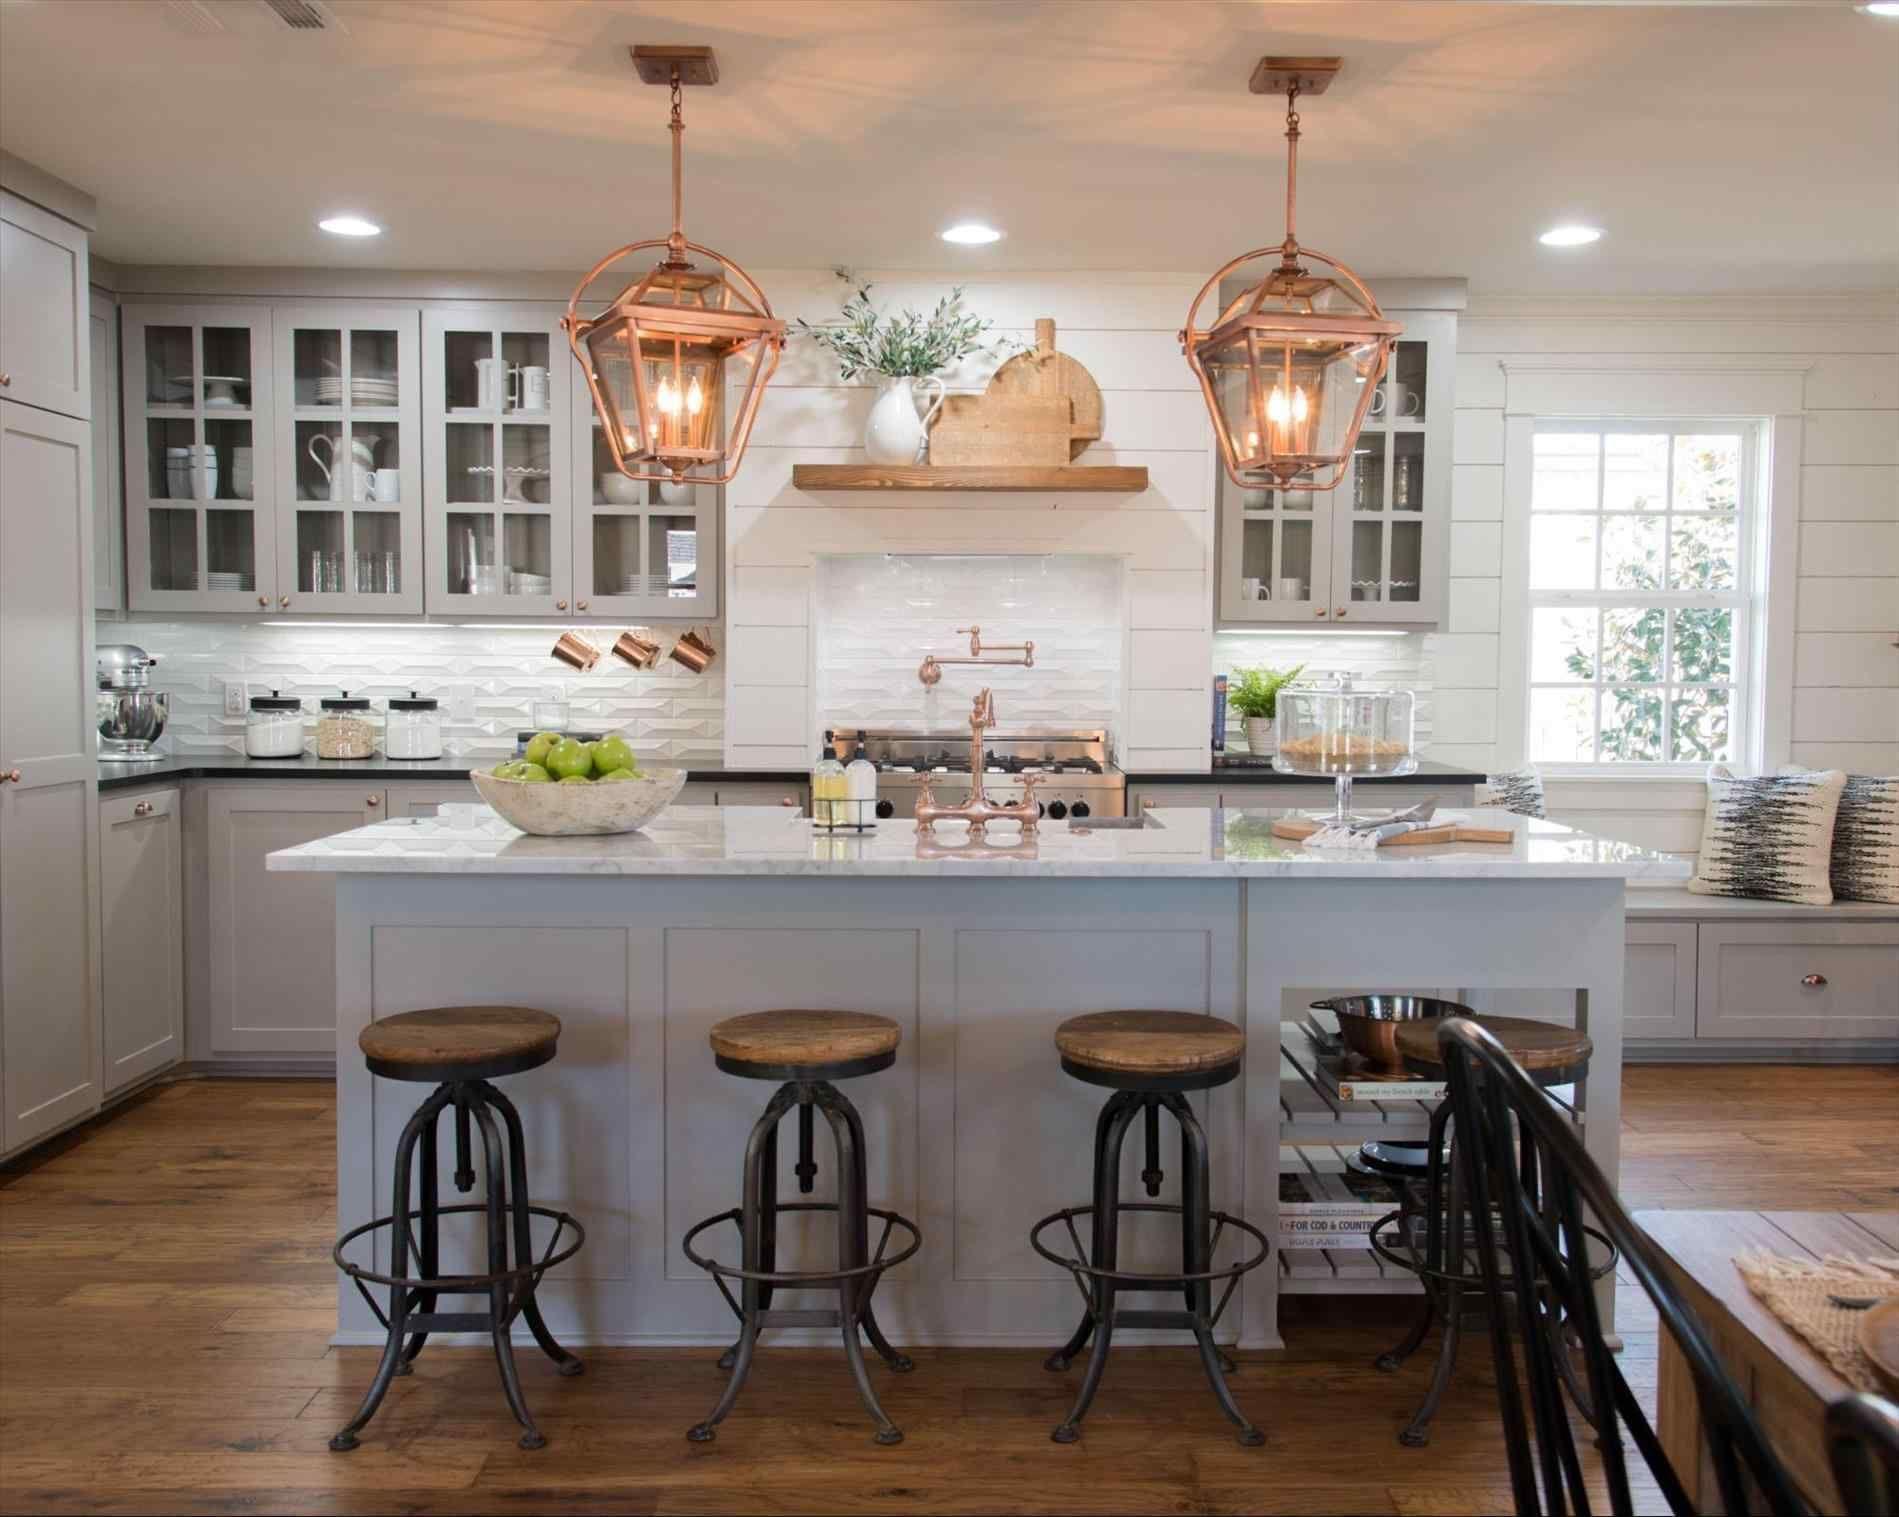 glomorous decoration joanna gaines kitchen ideas french country pendantisland decoration joanna on kitchen layout ideas with island joanna gaines id=70563